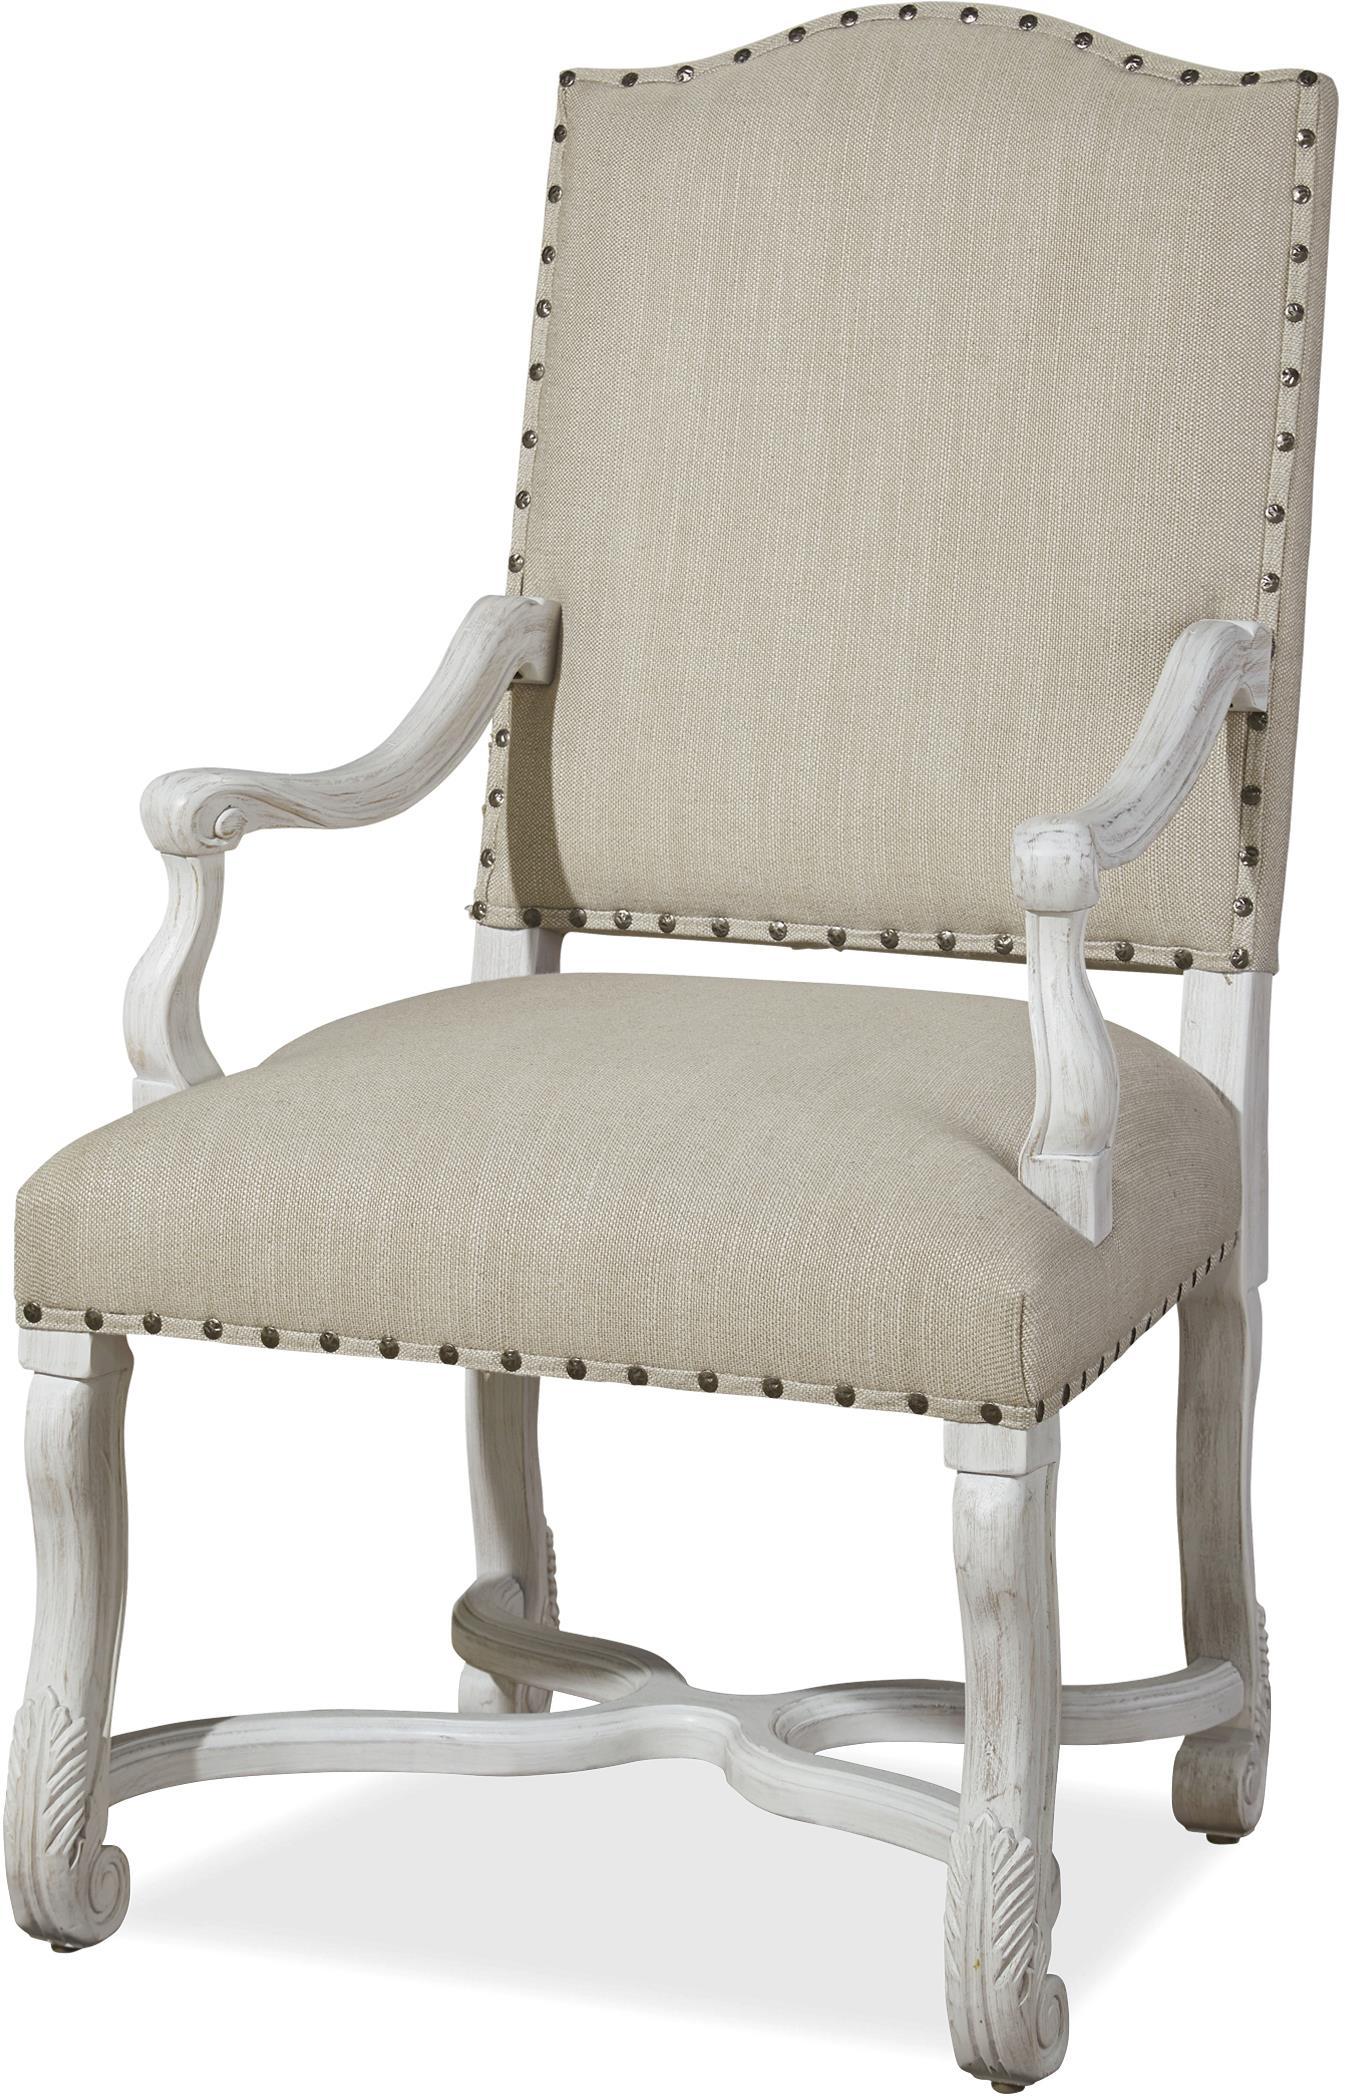 Universal Dogwood Paula & Michael's Host & Hostess Chair - Item Number: 597639-RTA